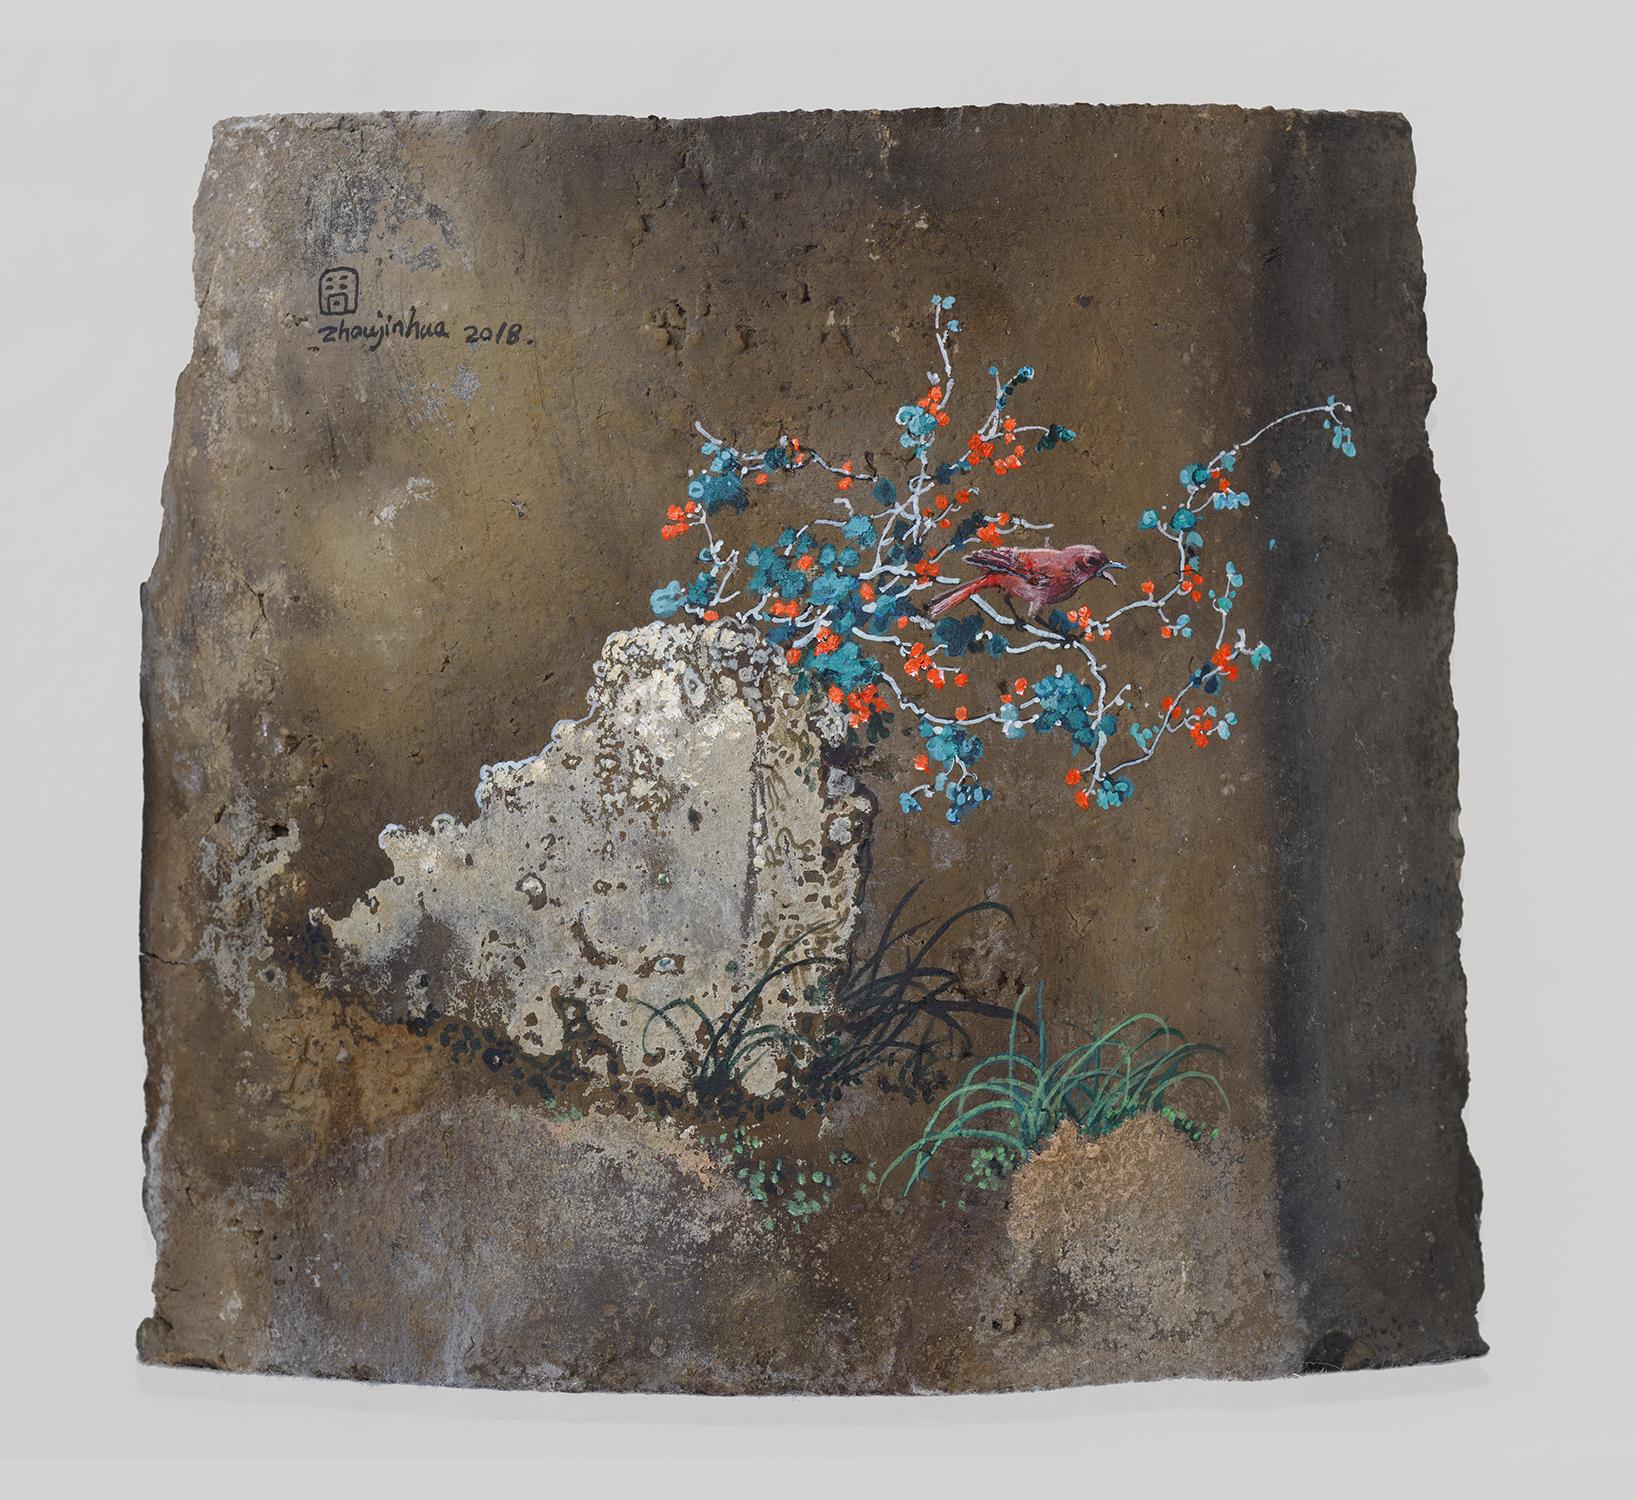 Zhou Jinhua 周金华, Remains of the Day 你我的痕迹 No.20, 2018, Acrylic on roof tile 瓦片、丙烯颜料, 17.5 x 19 cm